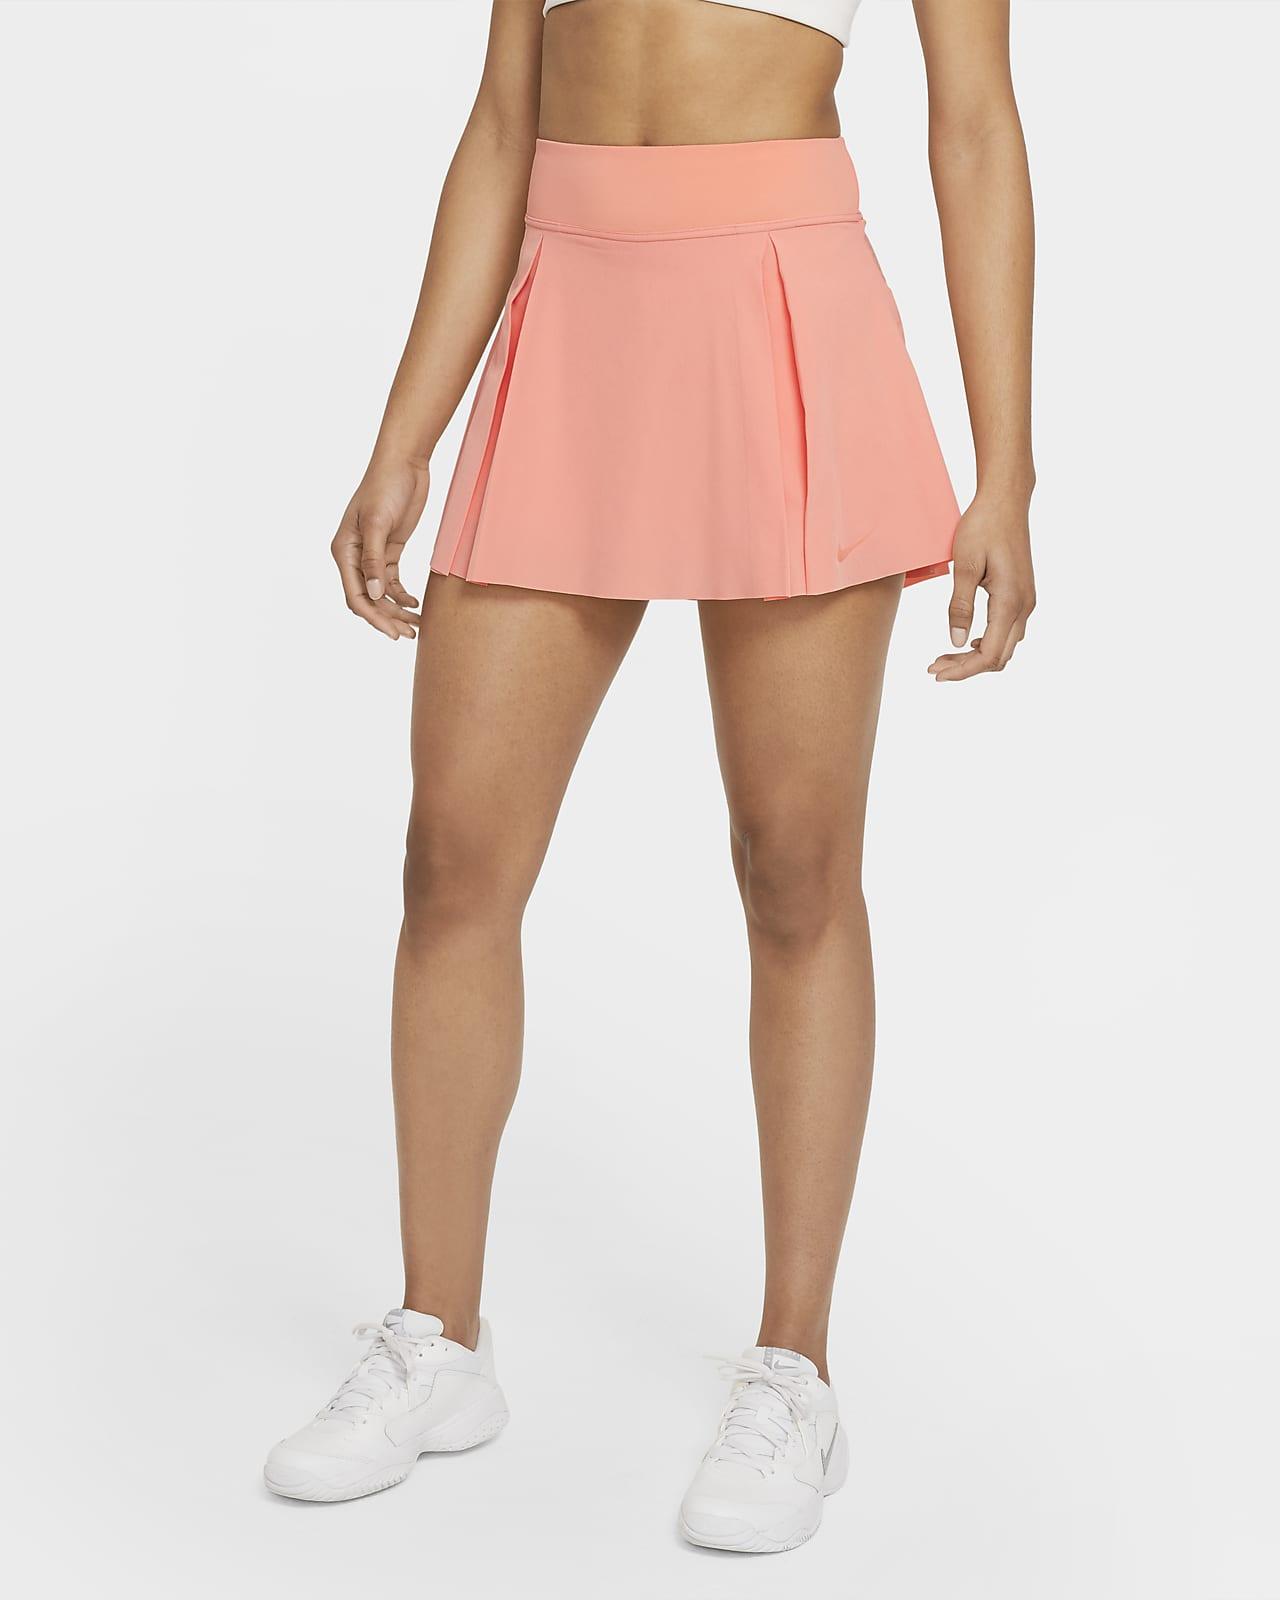 Gonna da tennis Regular Nike Club Skirt (Tall) - Donna